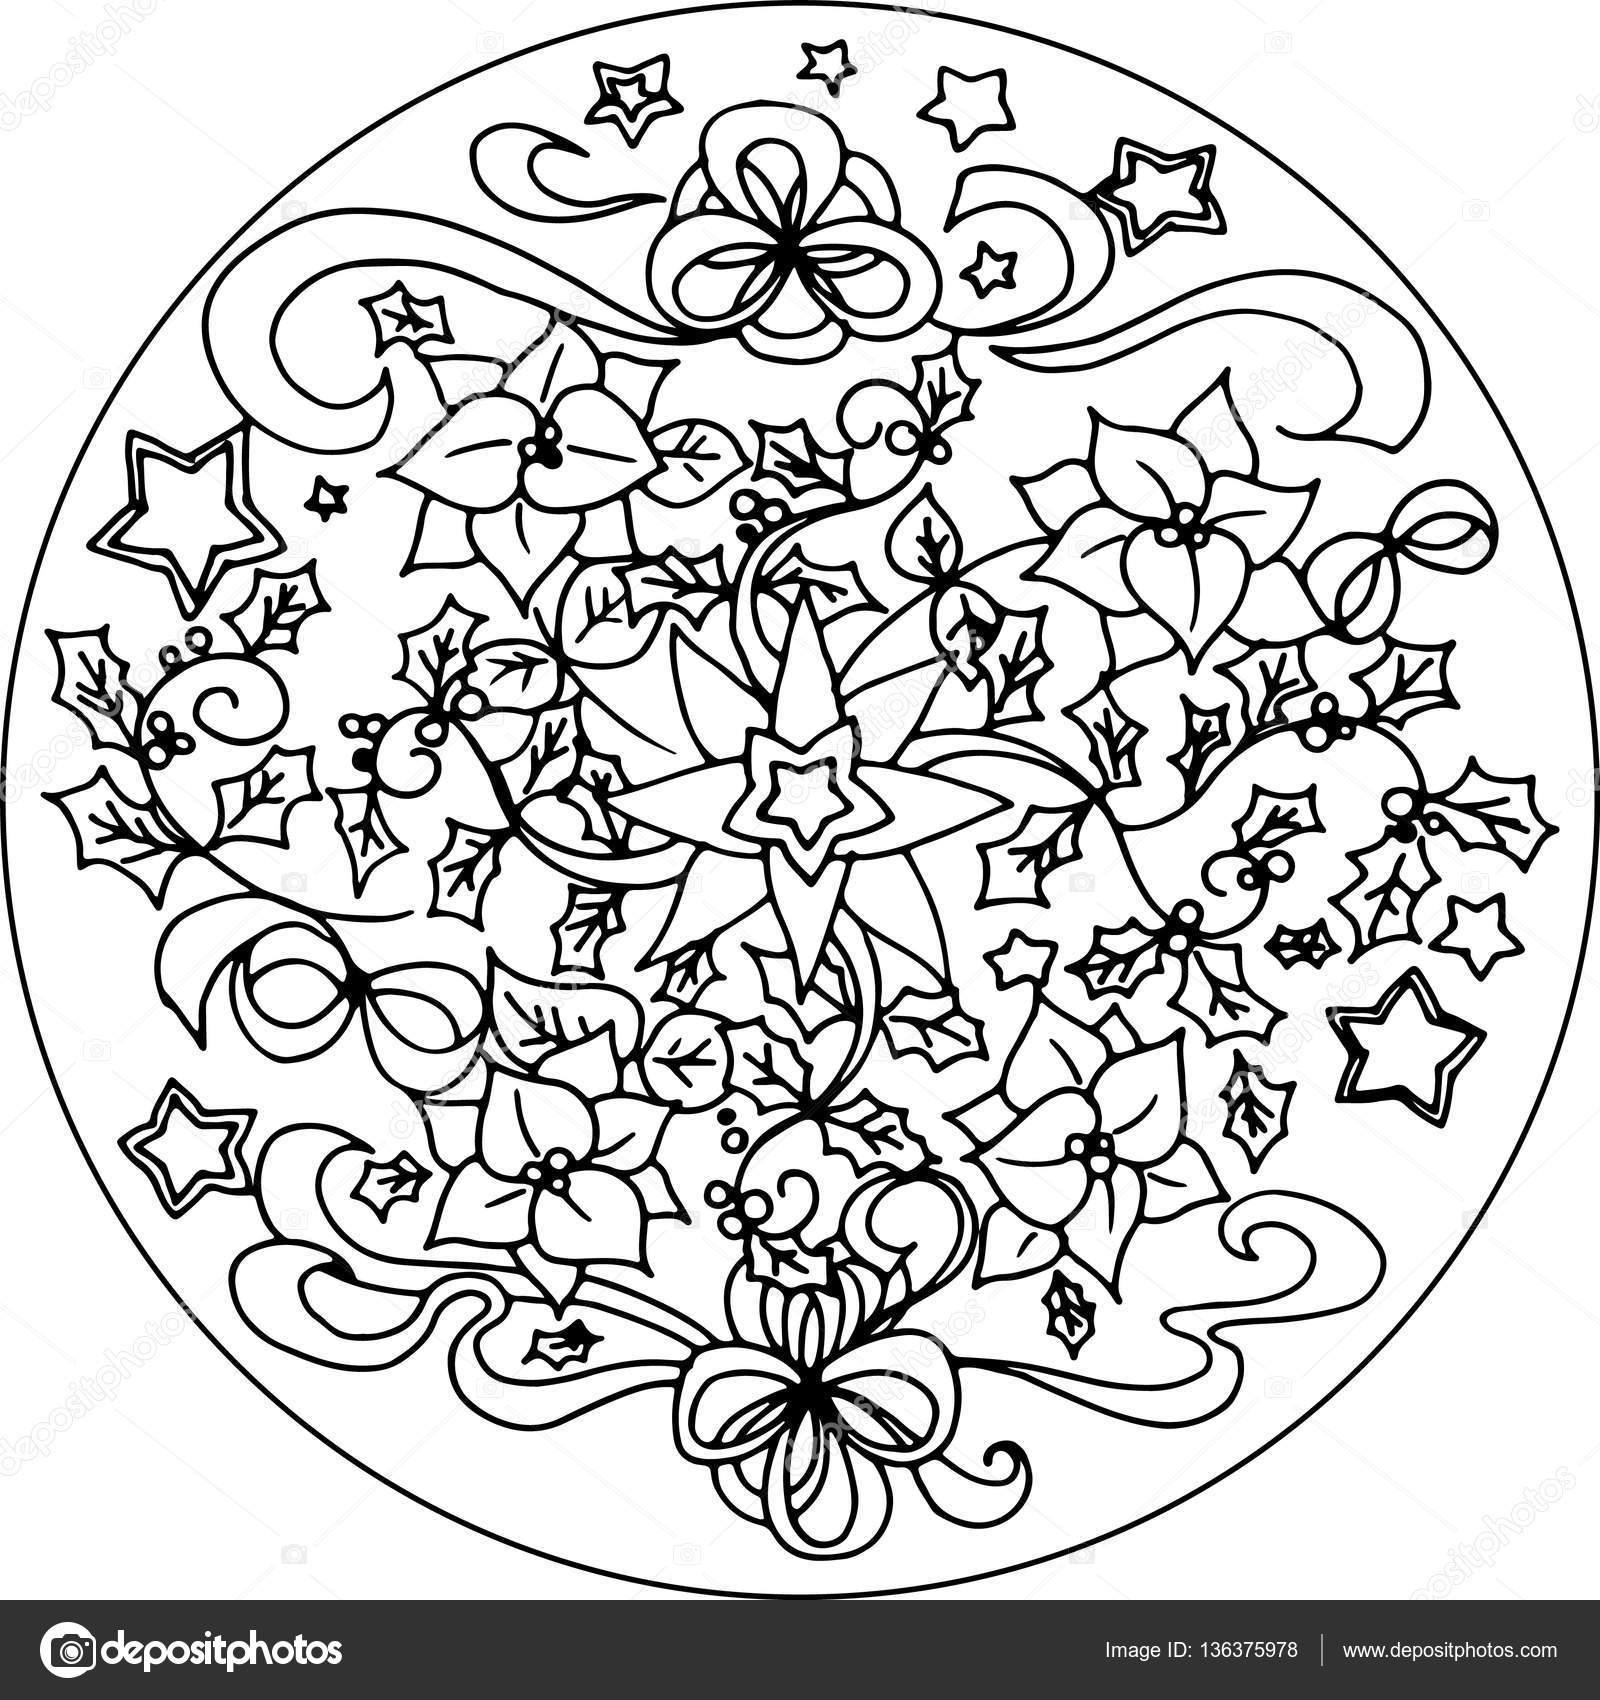 Weihnachten Malvorlagen Mandala Vektor Stockvektor Carlacastagno